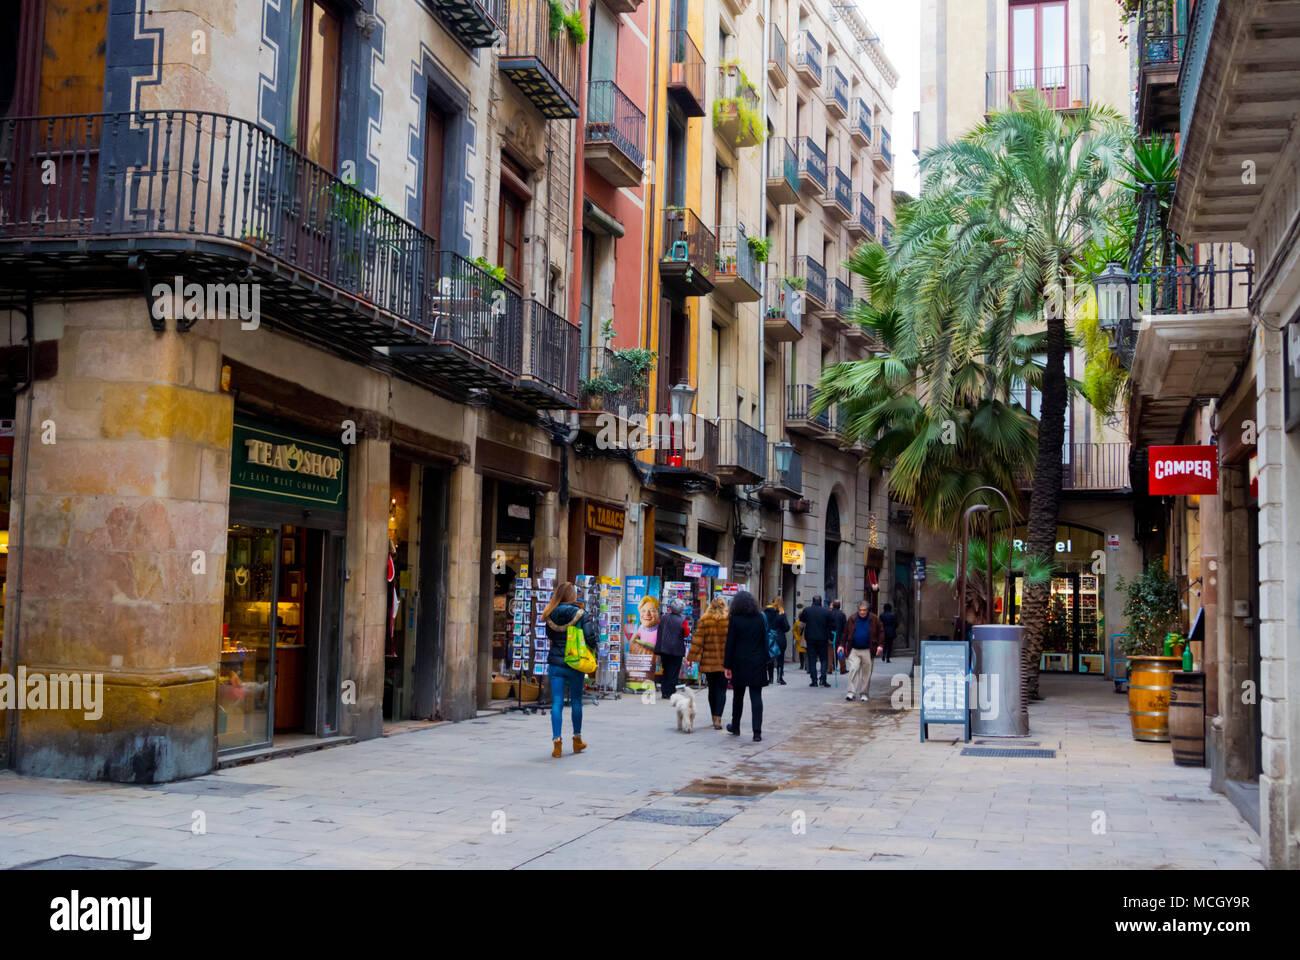 Placeta de Montcada, El Born, La Ribera, Barcelona, Catalonia, Spain - Stock Image